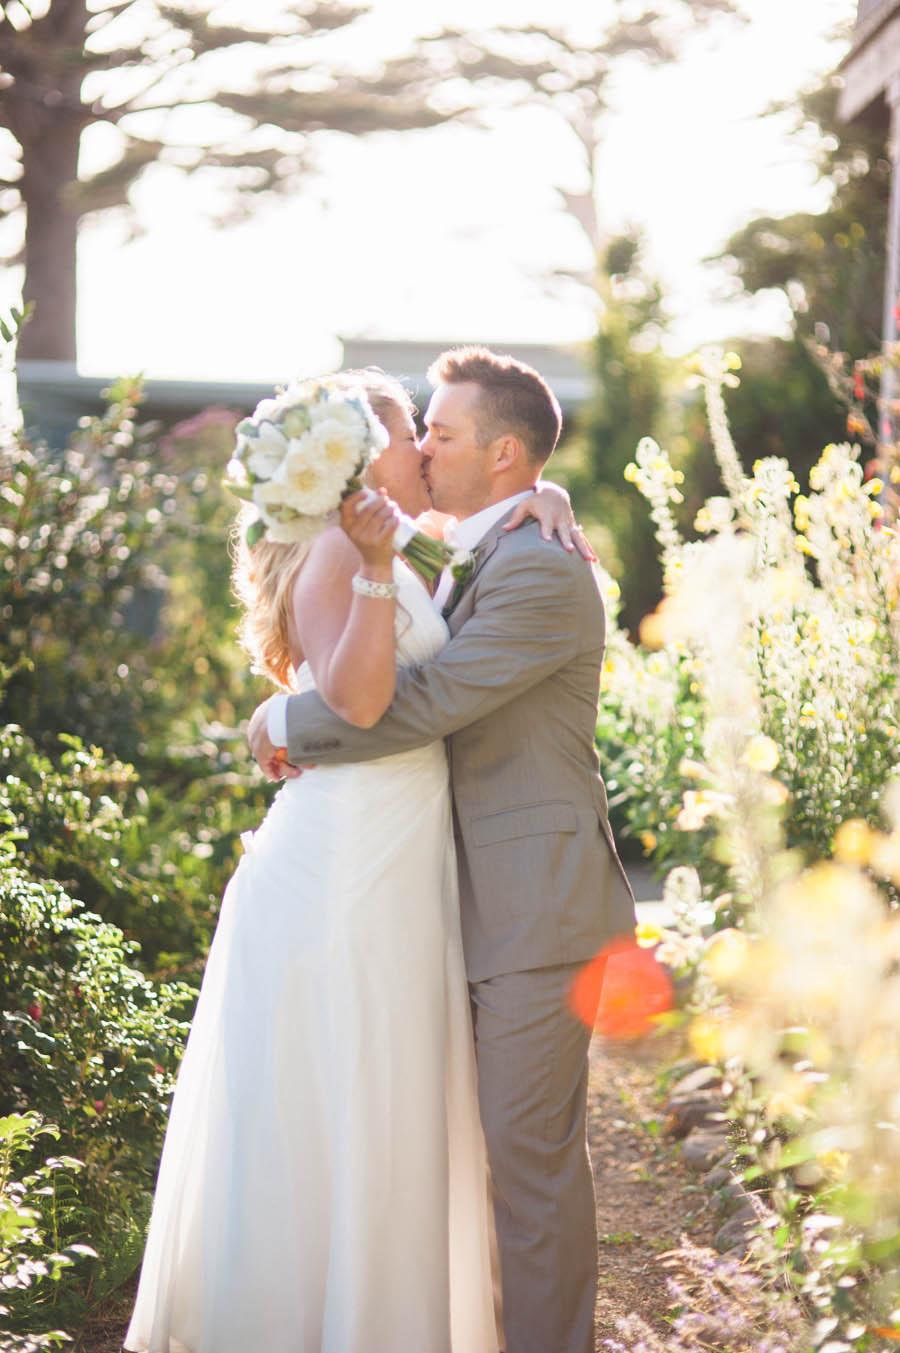 bride and groom epic golden hour portrait